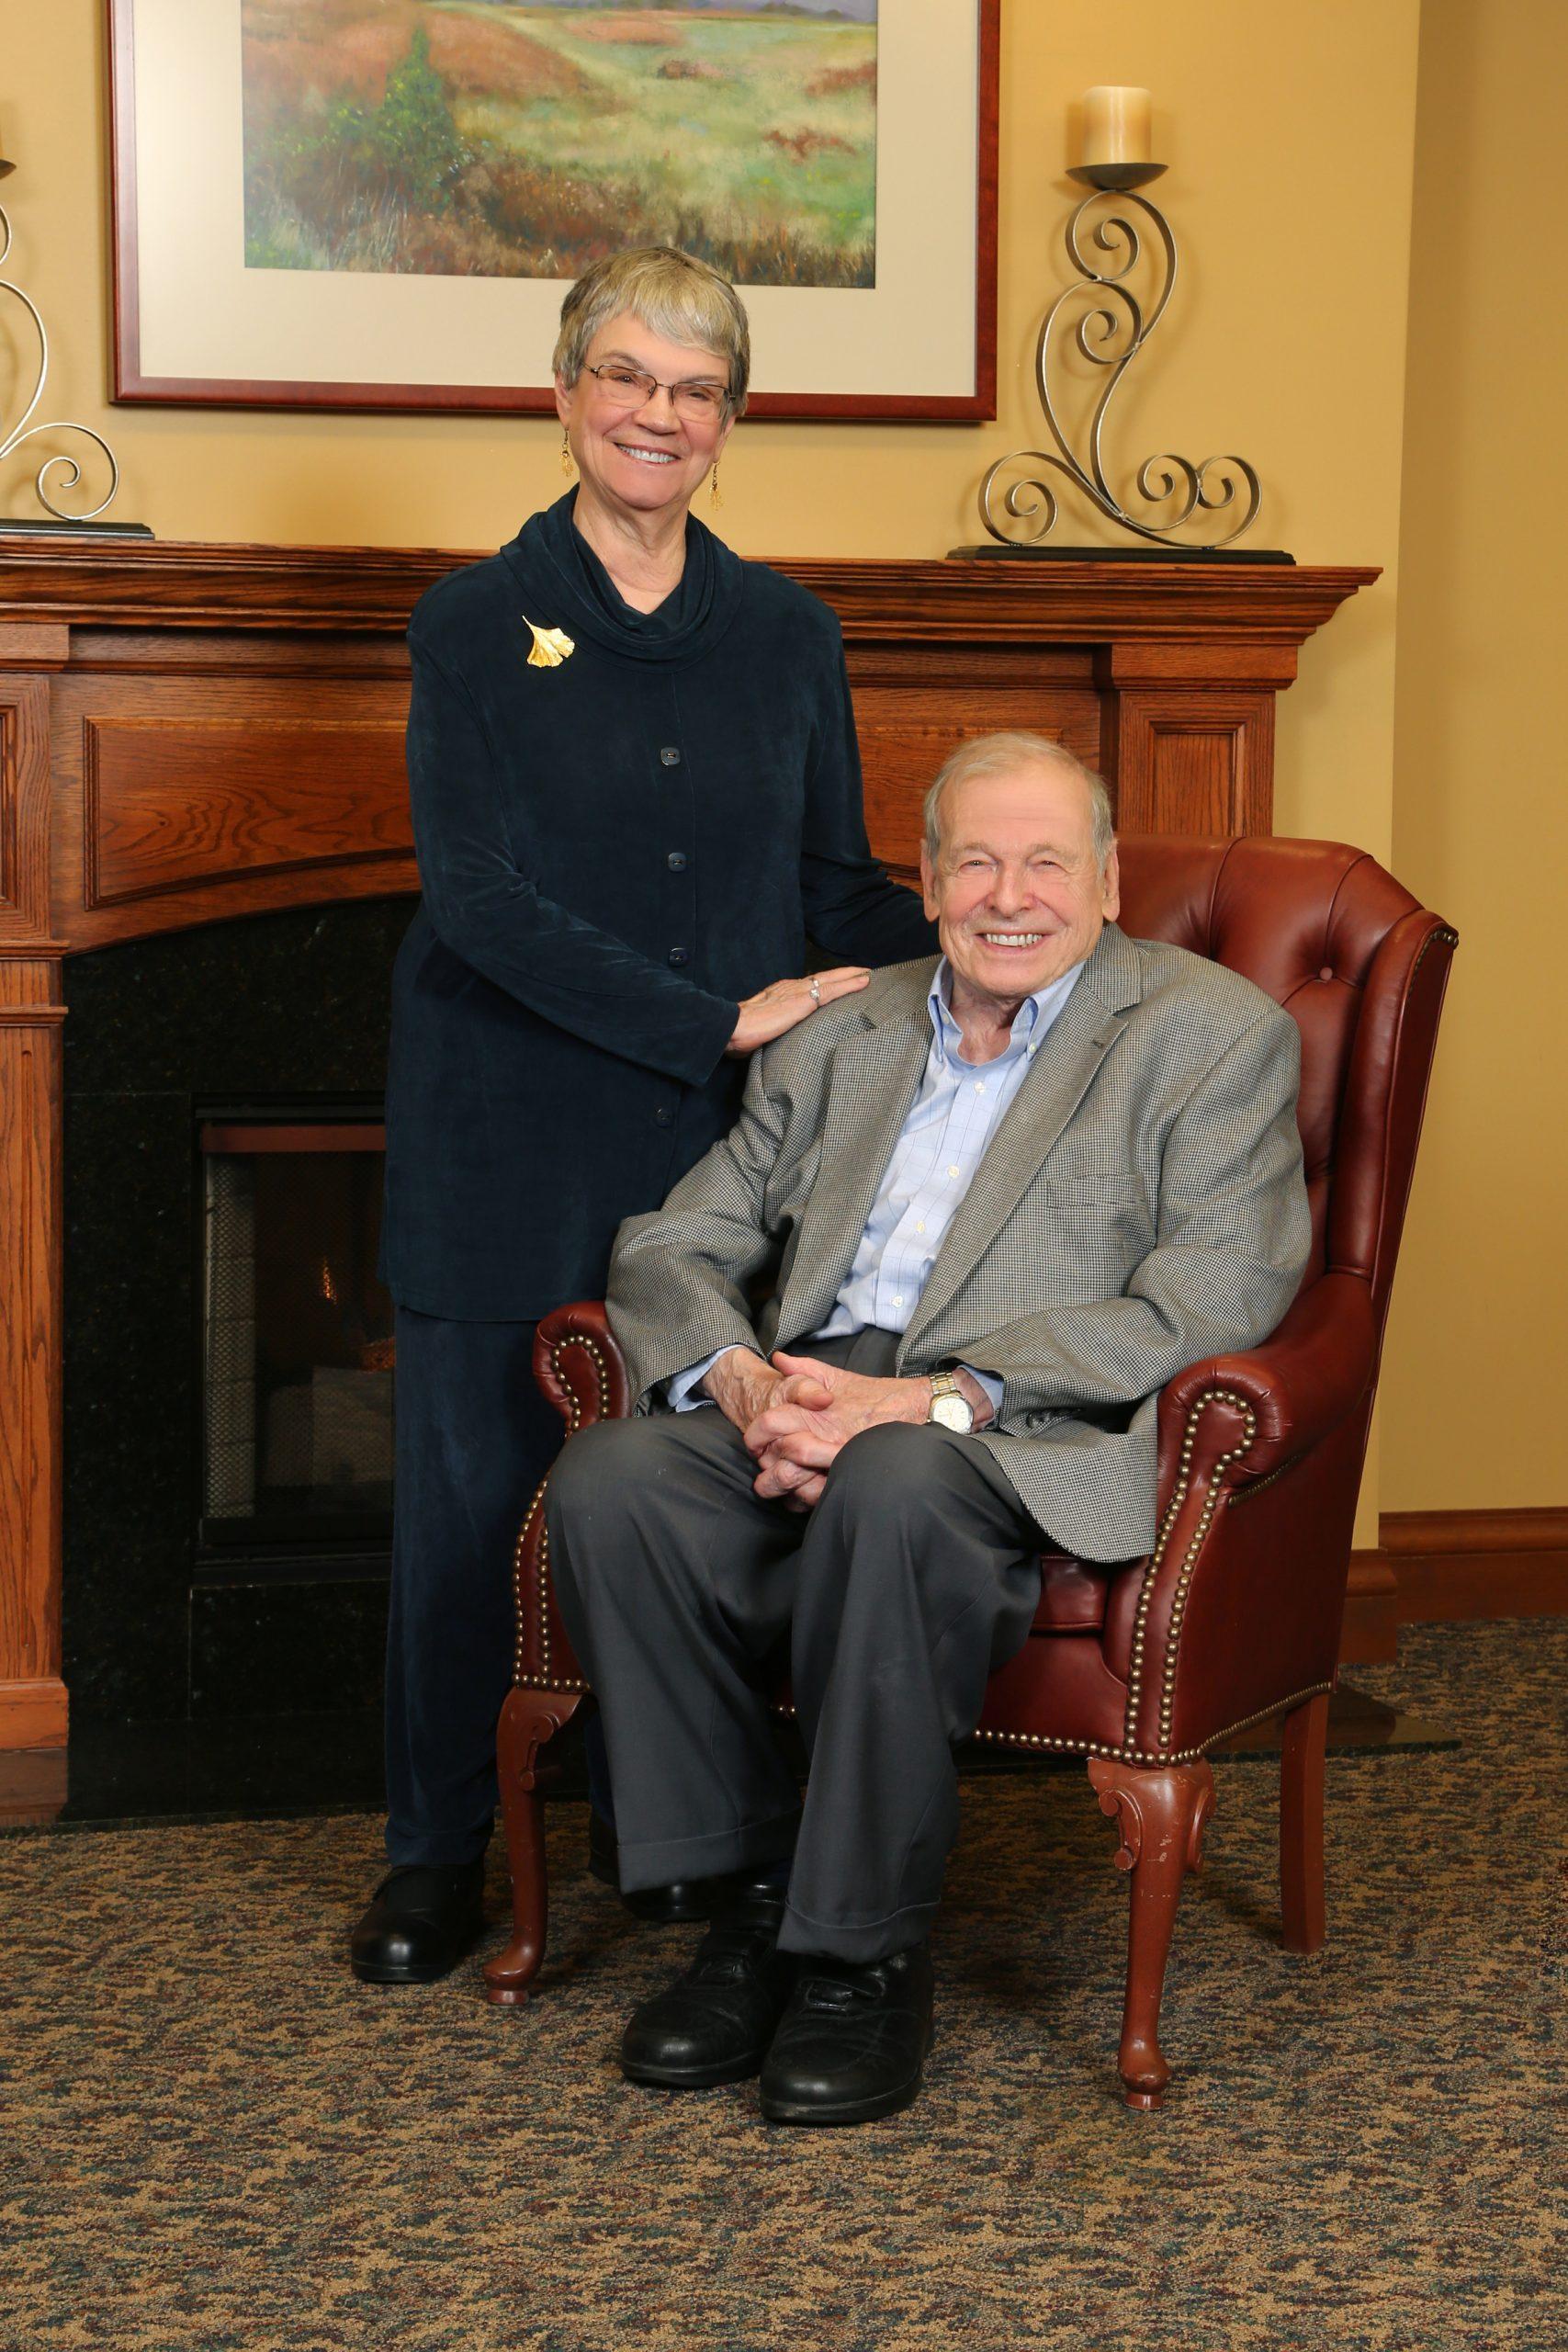 Peter Braunfeld and his wife, Judith Morse Braunfeld